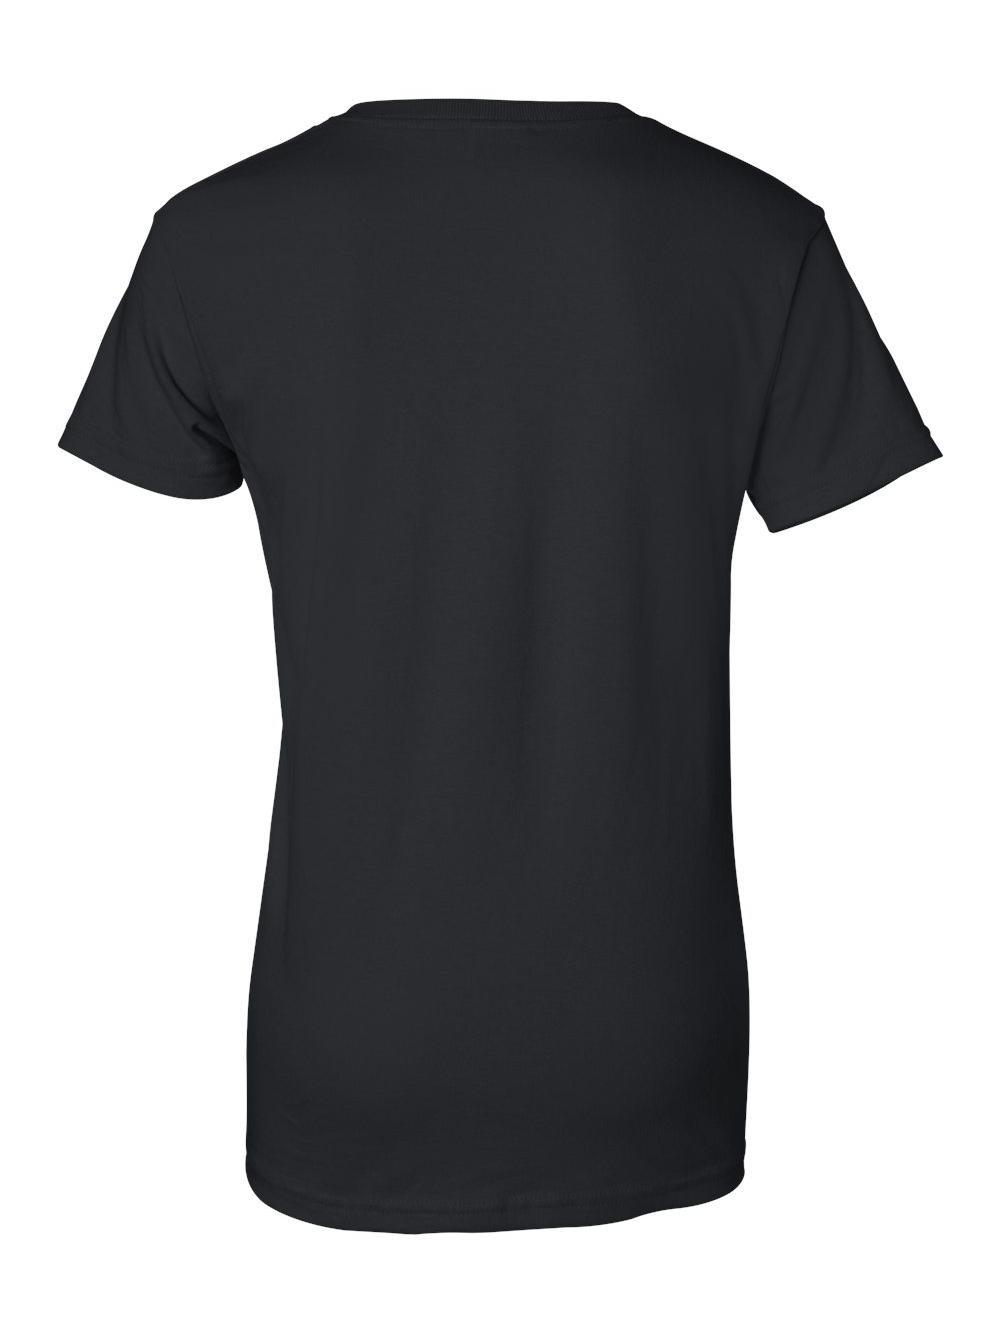 Gildan-Ultra-Cotton-Women-039-s-T-Shirt-2000L thumbnail 4